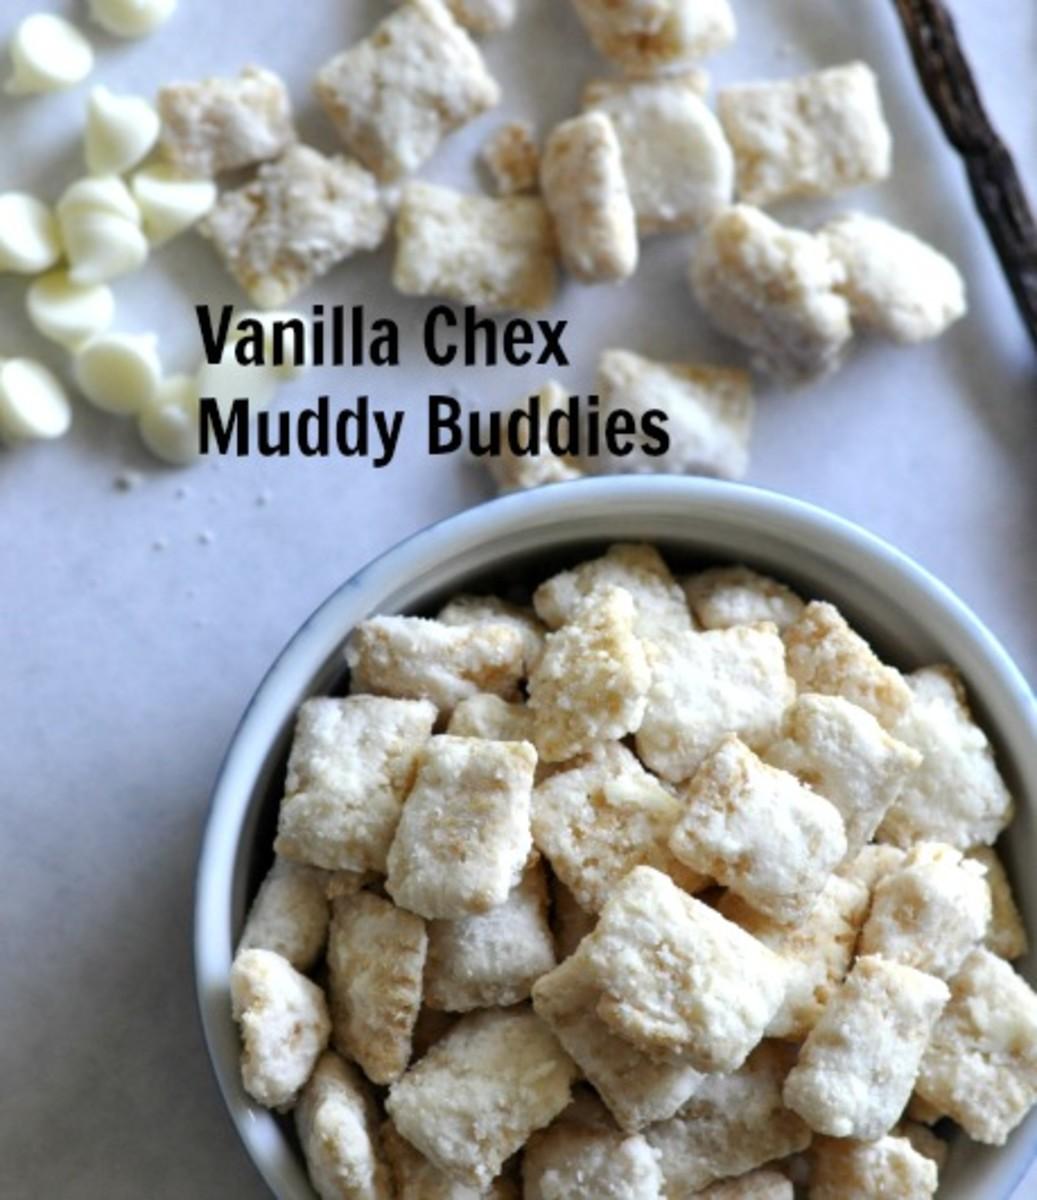 Vanilla Chex Muddy Buddies - Title